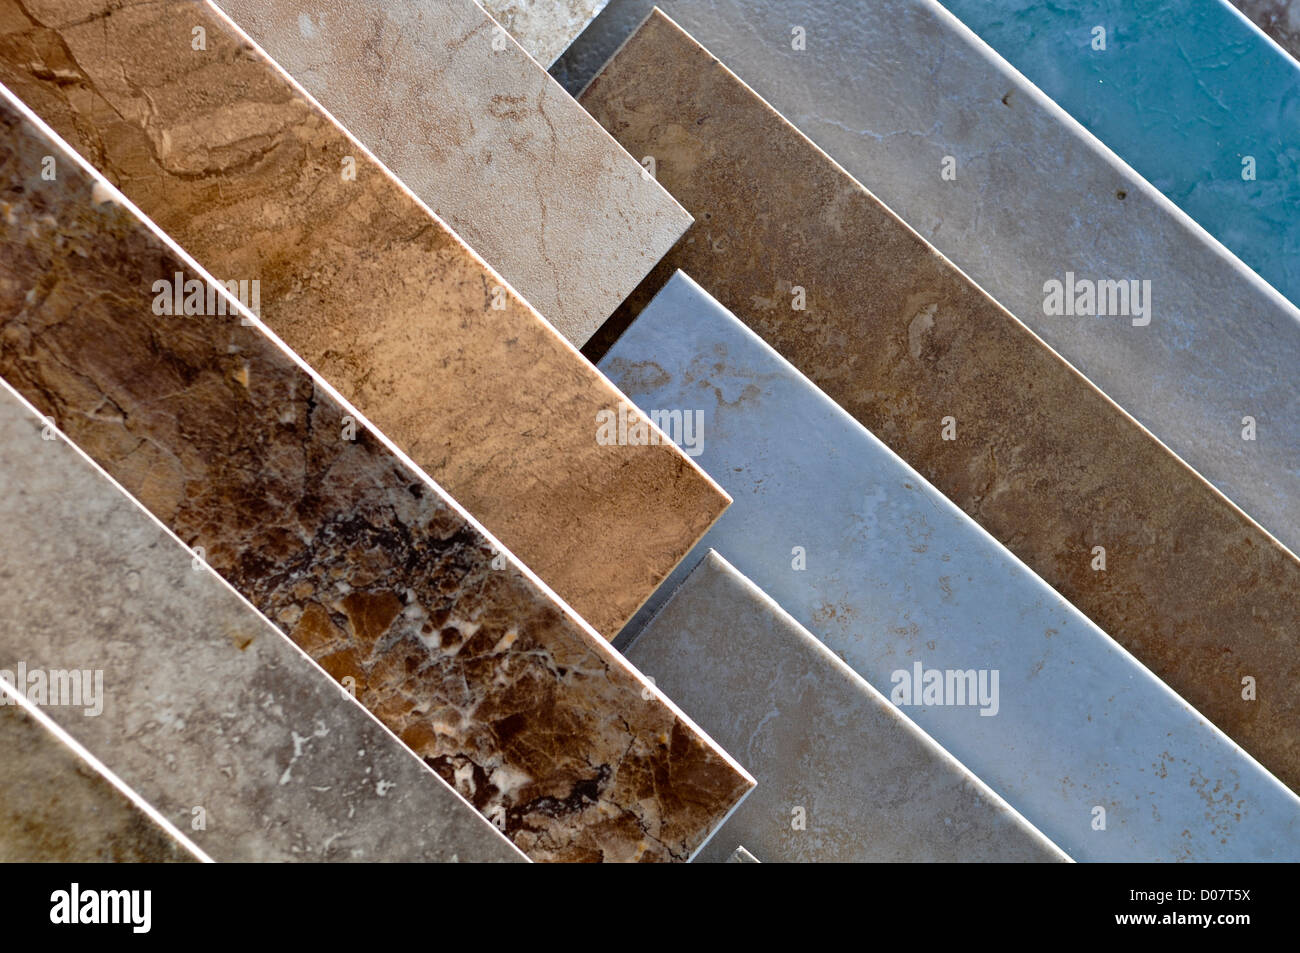 Ceramic Tile Samples Store Stock Photo Royalty Free Image